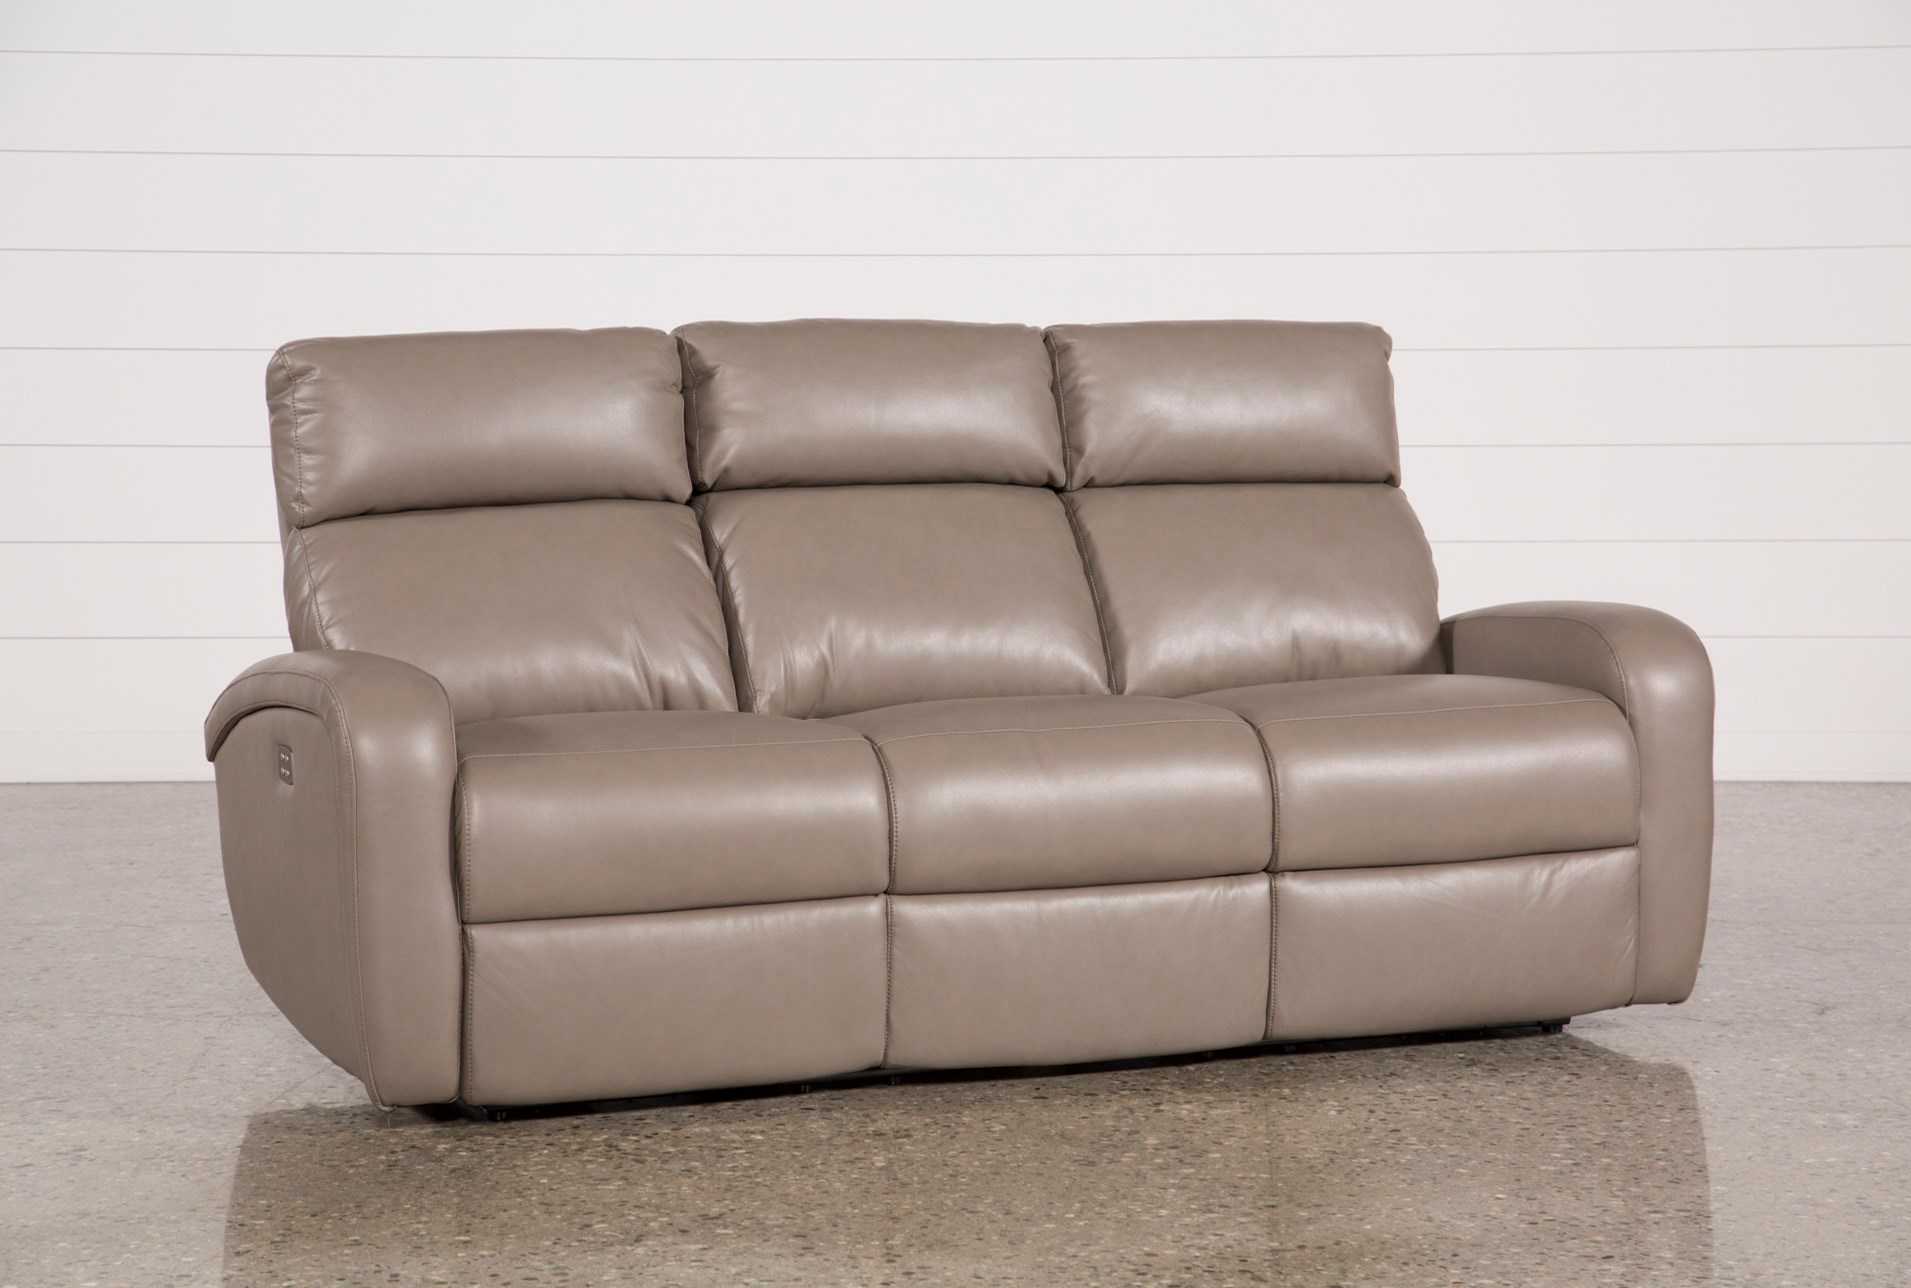 Darwin Taupe Power Reclining Sofa Living Spaces ~ Two Cushion Reclining Sofa